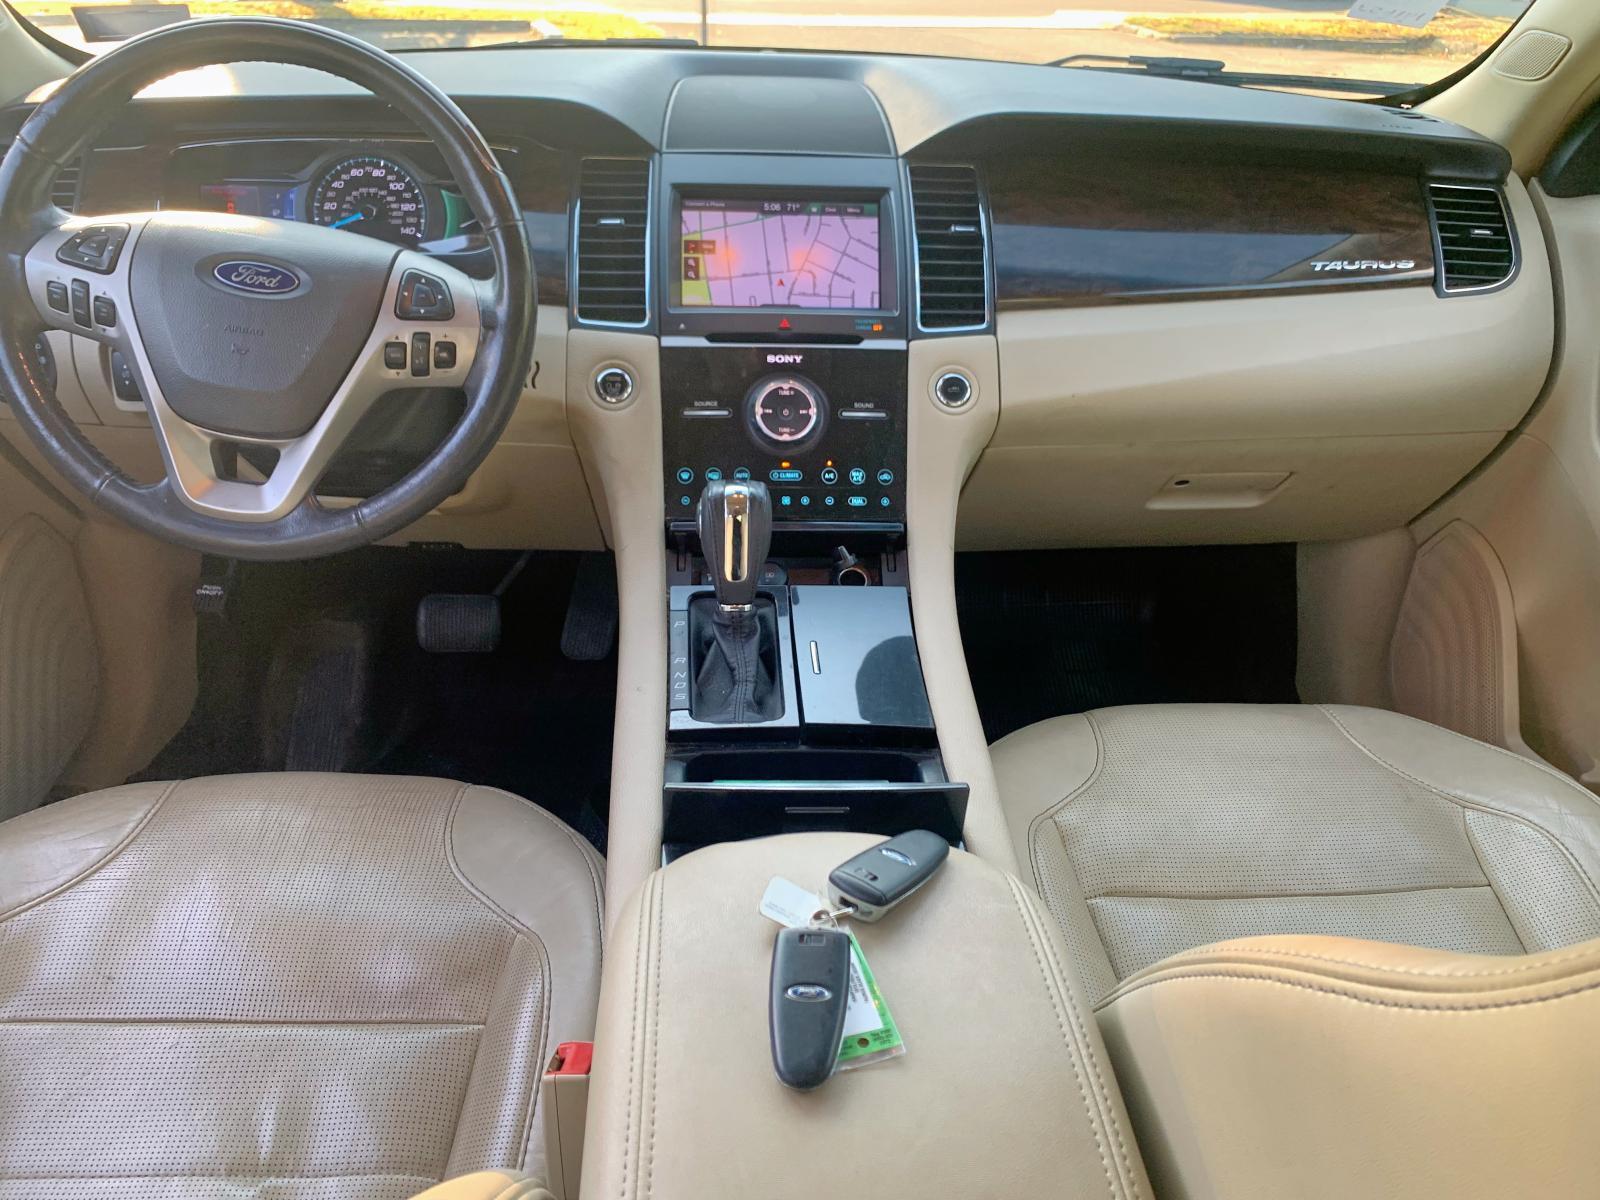 1FAHP2J81DG179537 - 2013 Ford Taurus Lim 3.5L close up View